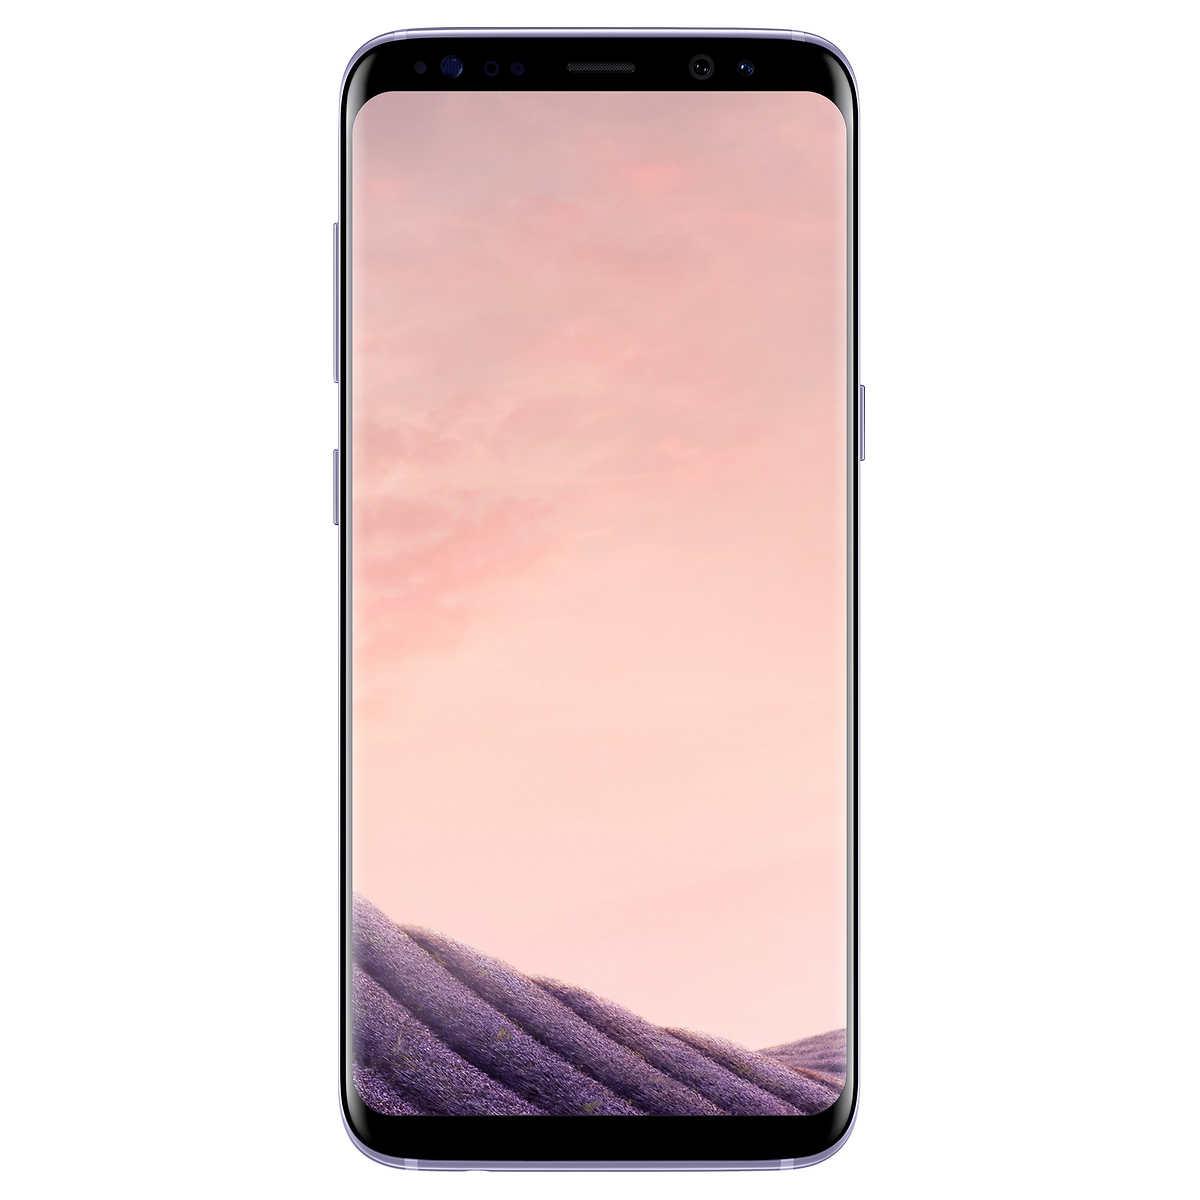 Samsung Galaxy S8 Orchid Grey Smartphone Unlocked